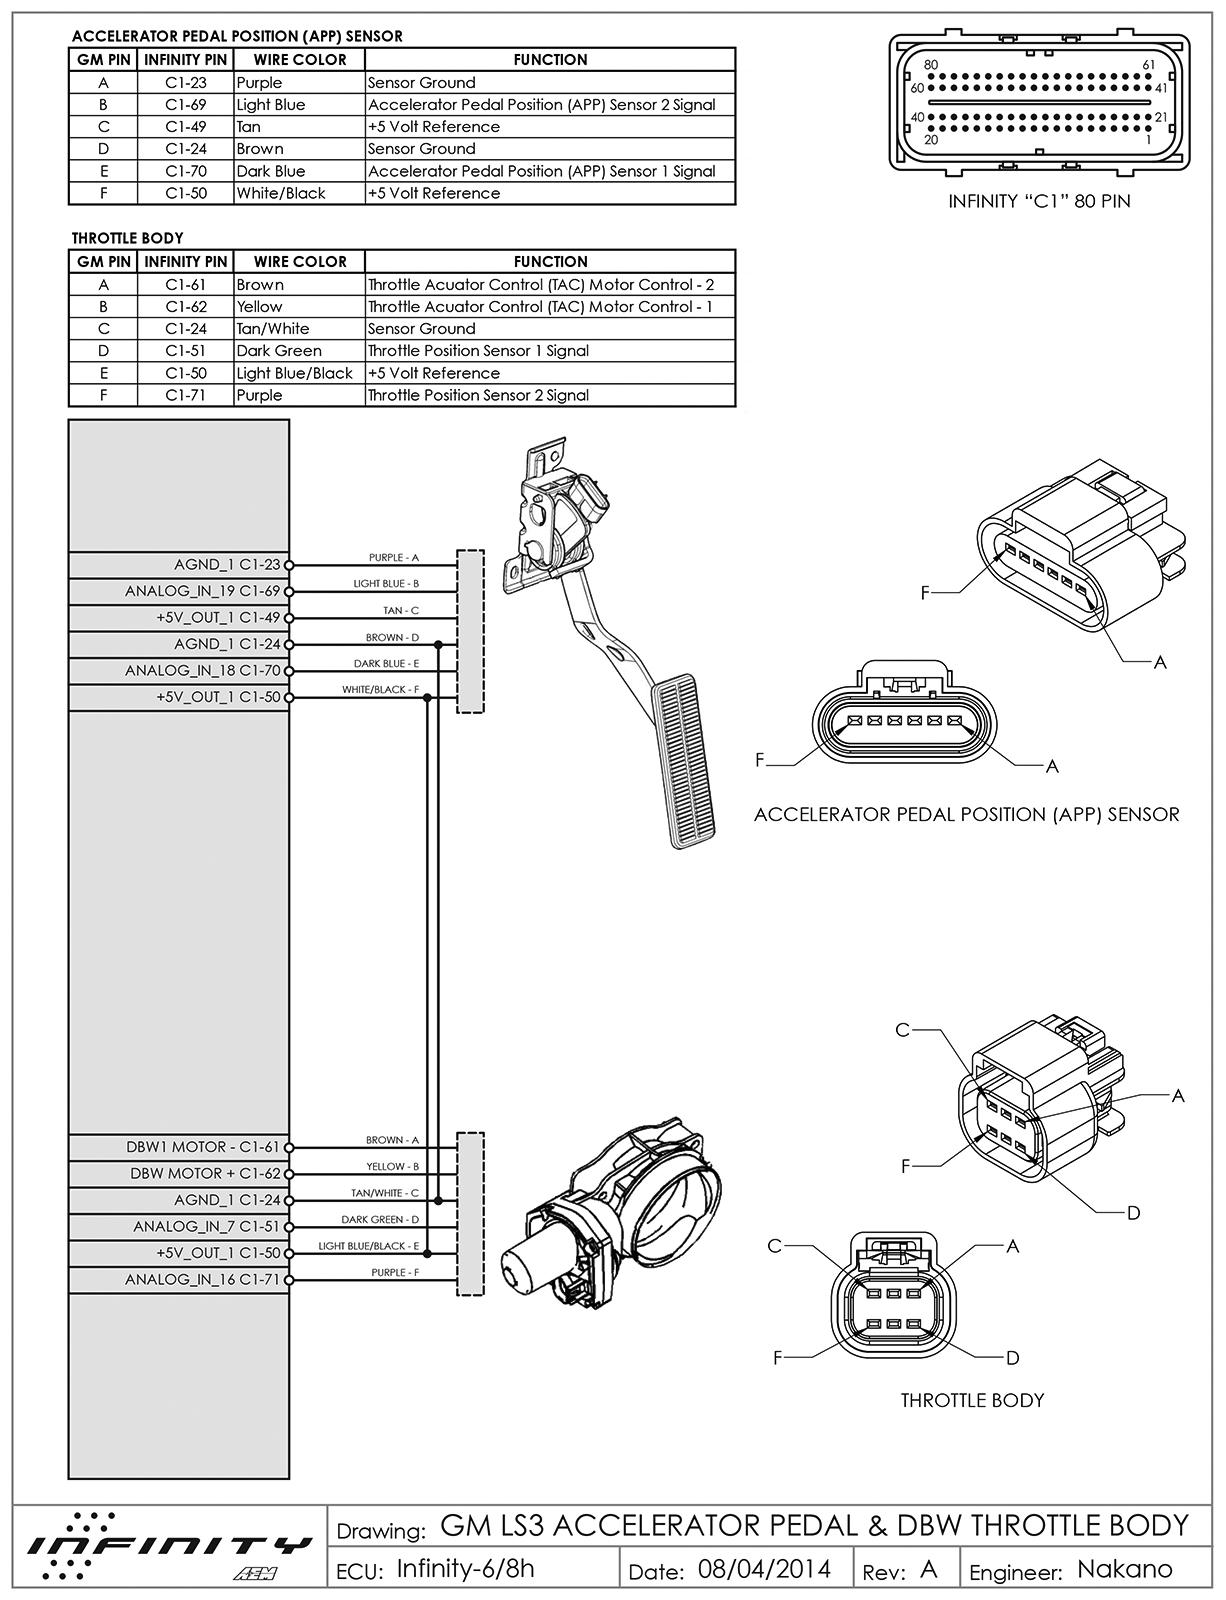 5 Pin Maf Wiring Diagram - All Wiring Diagram Maf Sensor Wiring Diagram Wire Mustang Gt on